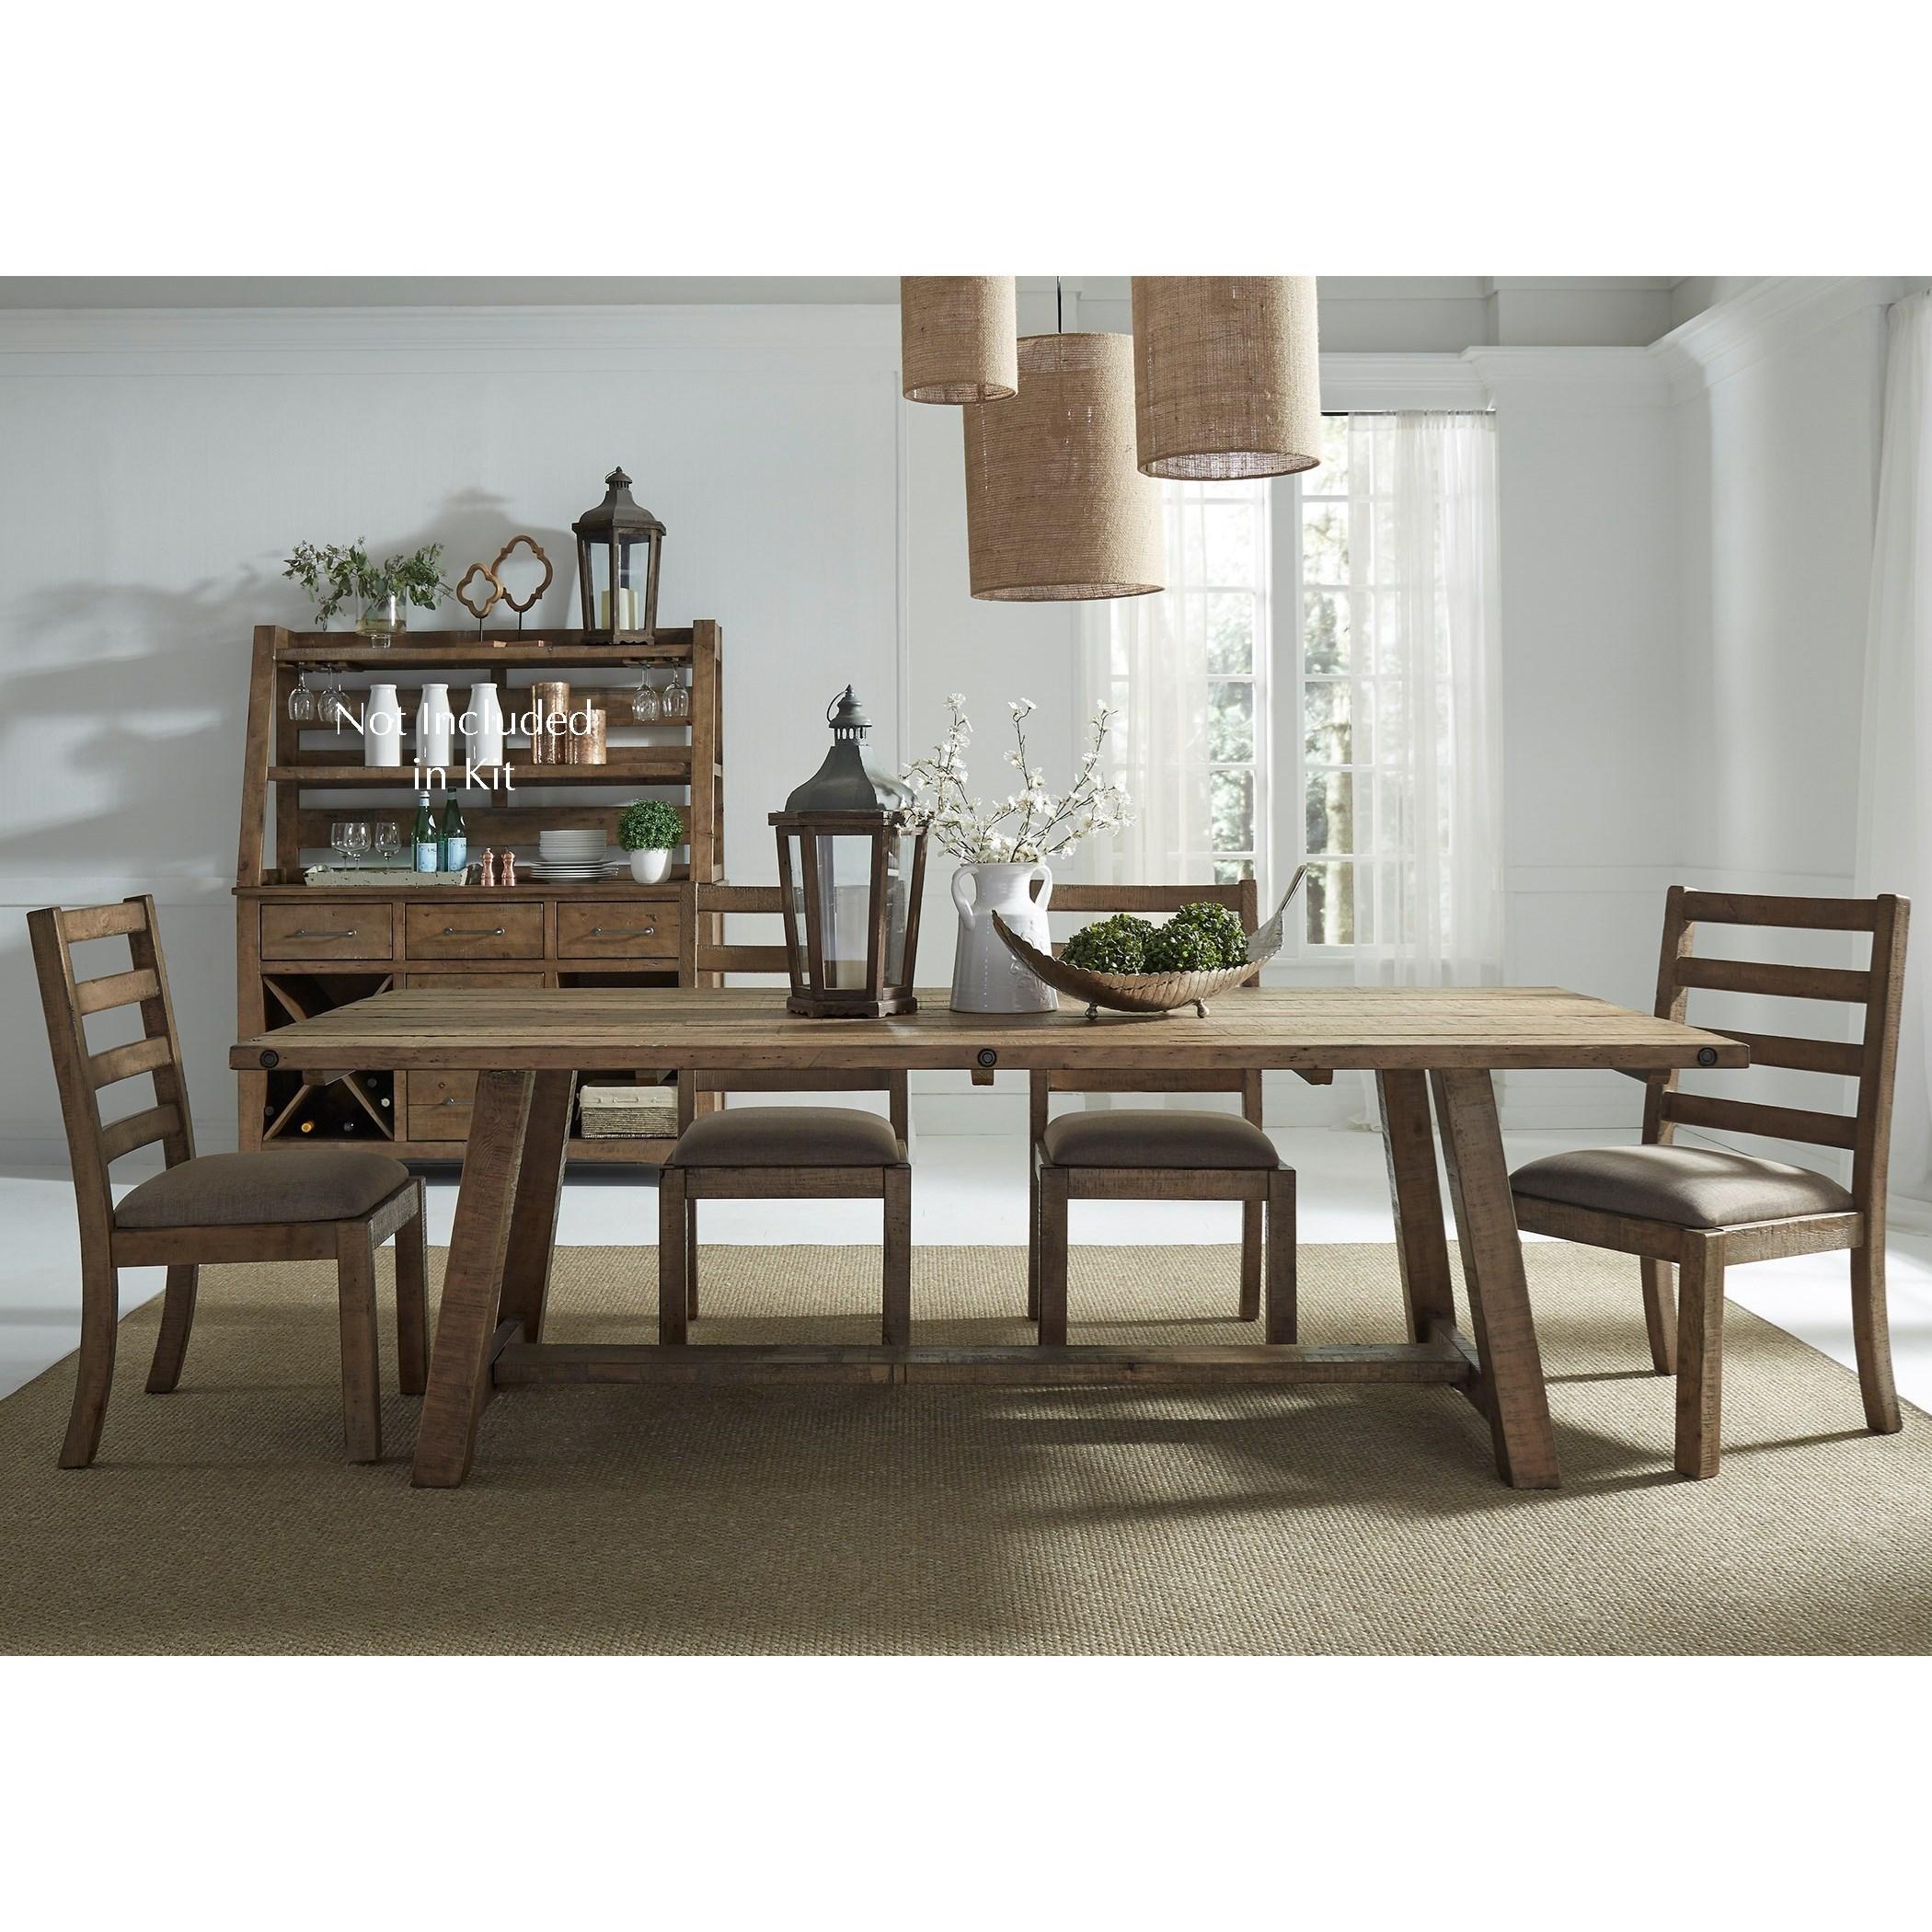 Amazing Liberty Furniture Prescott Valley5 Piece 96